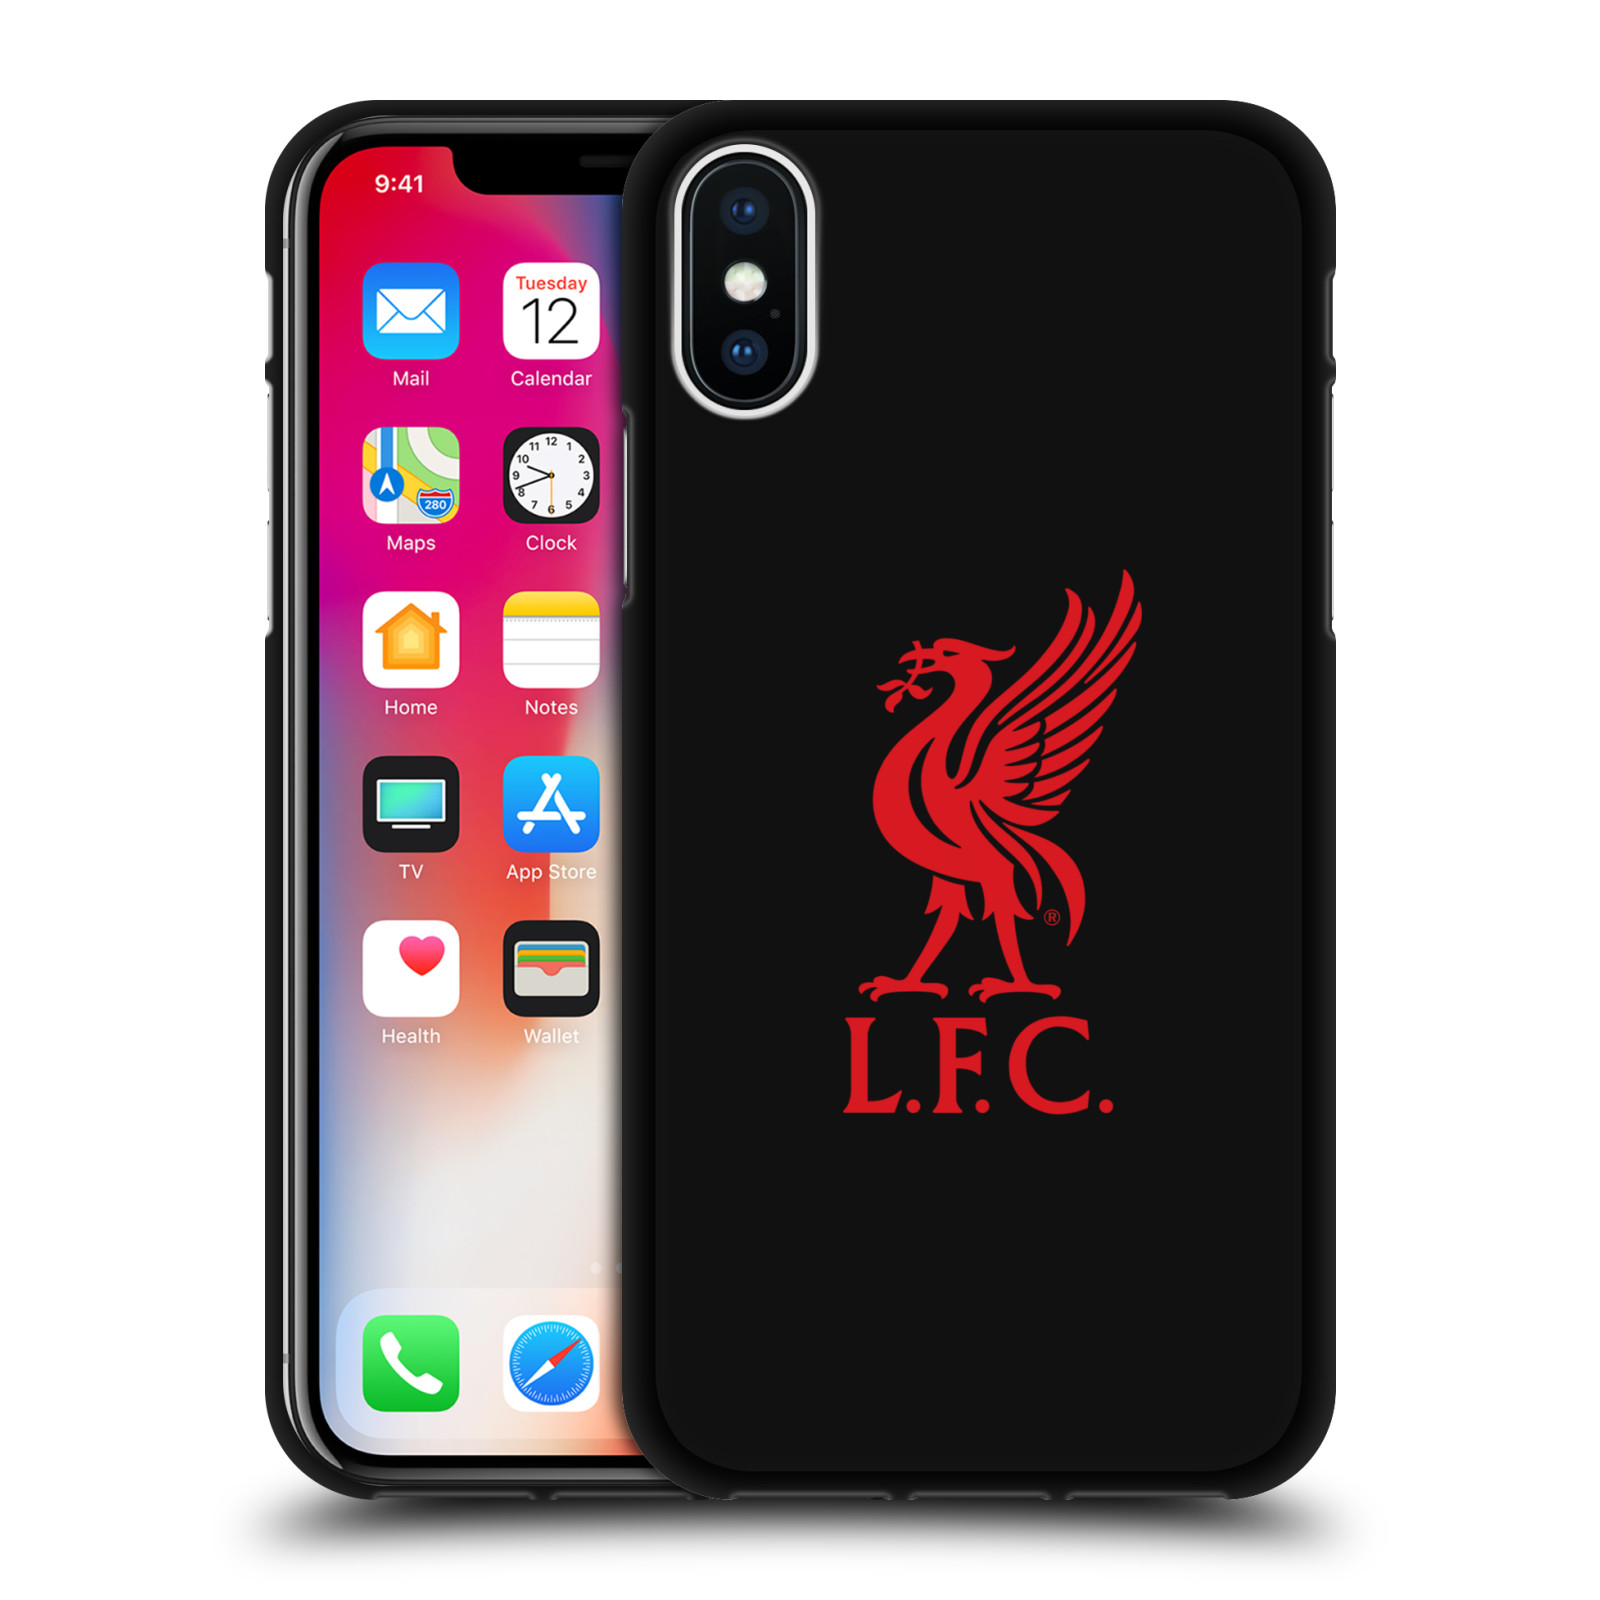 LIVERPOOL-FC-LFC-VARIOUS-DESIGNS-BLACK-SOFT-GEL-CASE-FOR-APPLE-iPHONE-PHONES